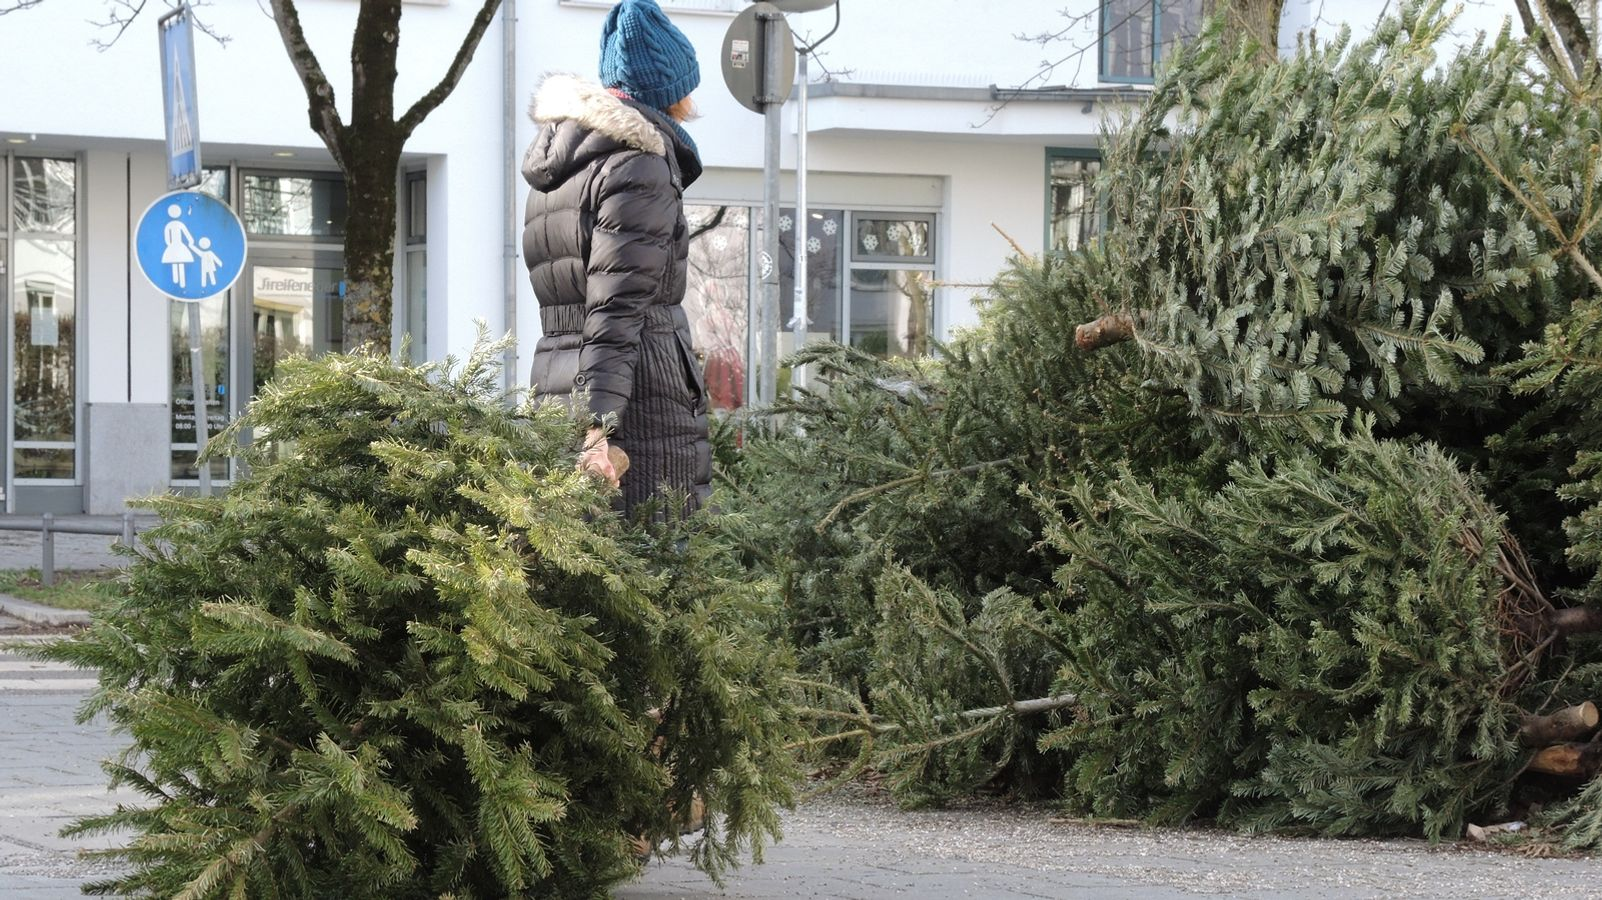 Weihnachten - Christmas - Noël - cover